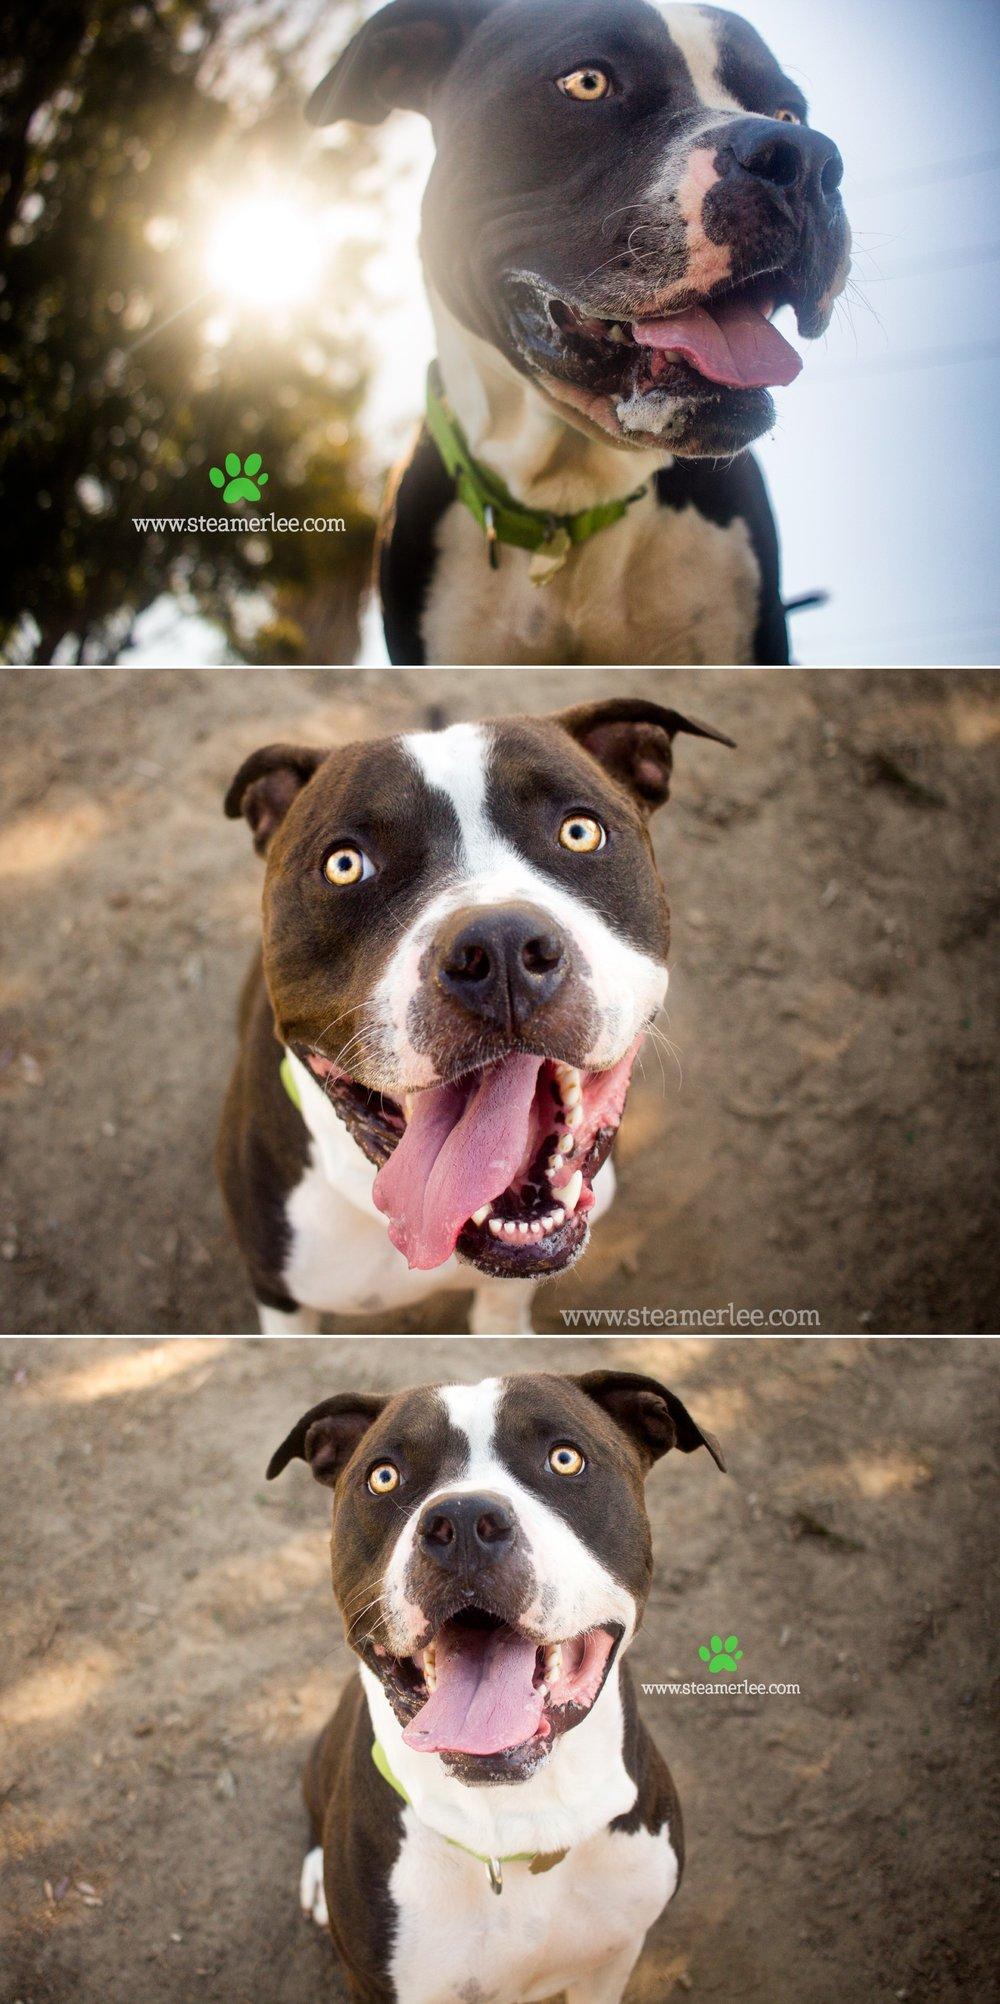 07 Steamer Lee Dog Photography - Seal Beach Animal Care Center.JPG